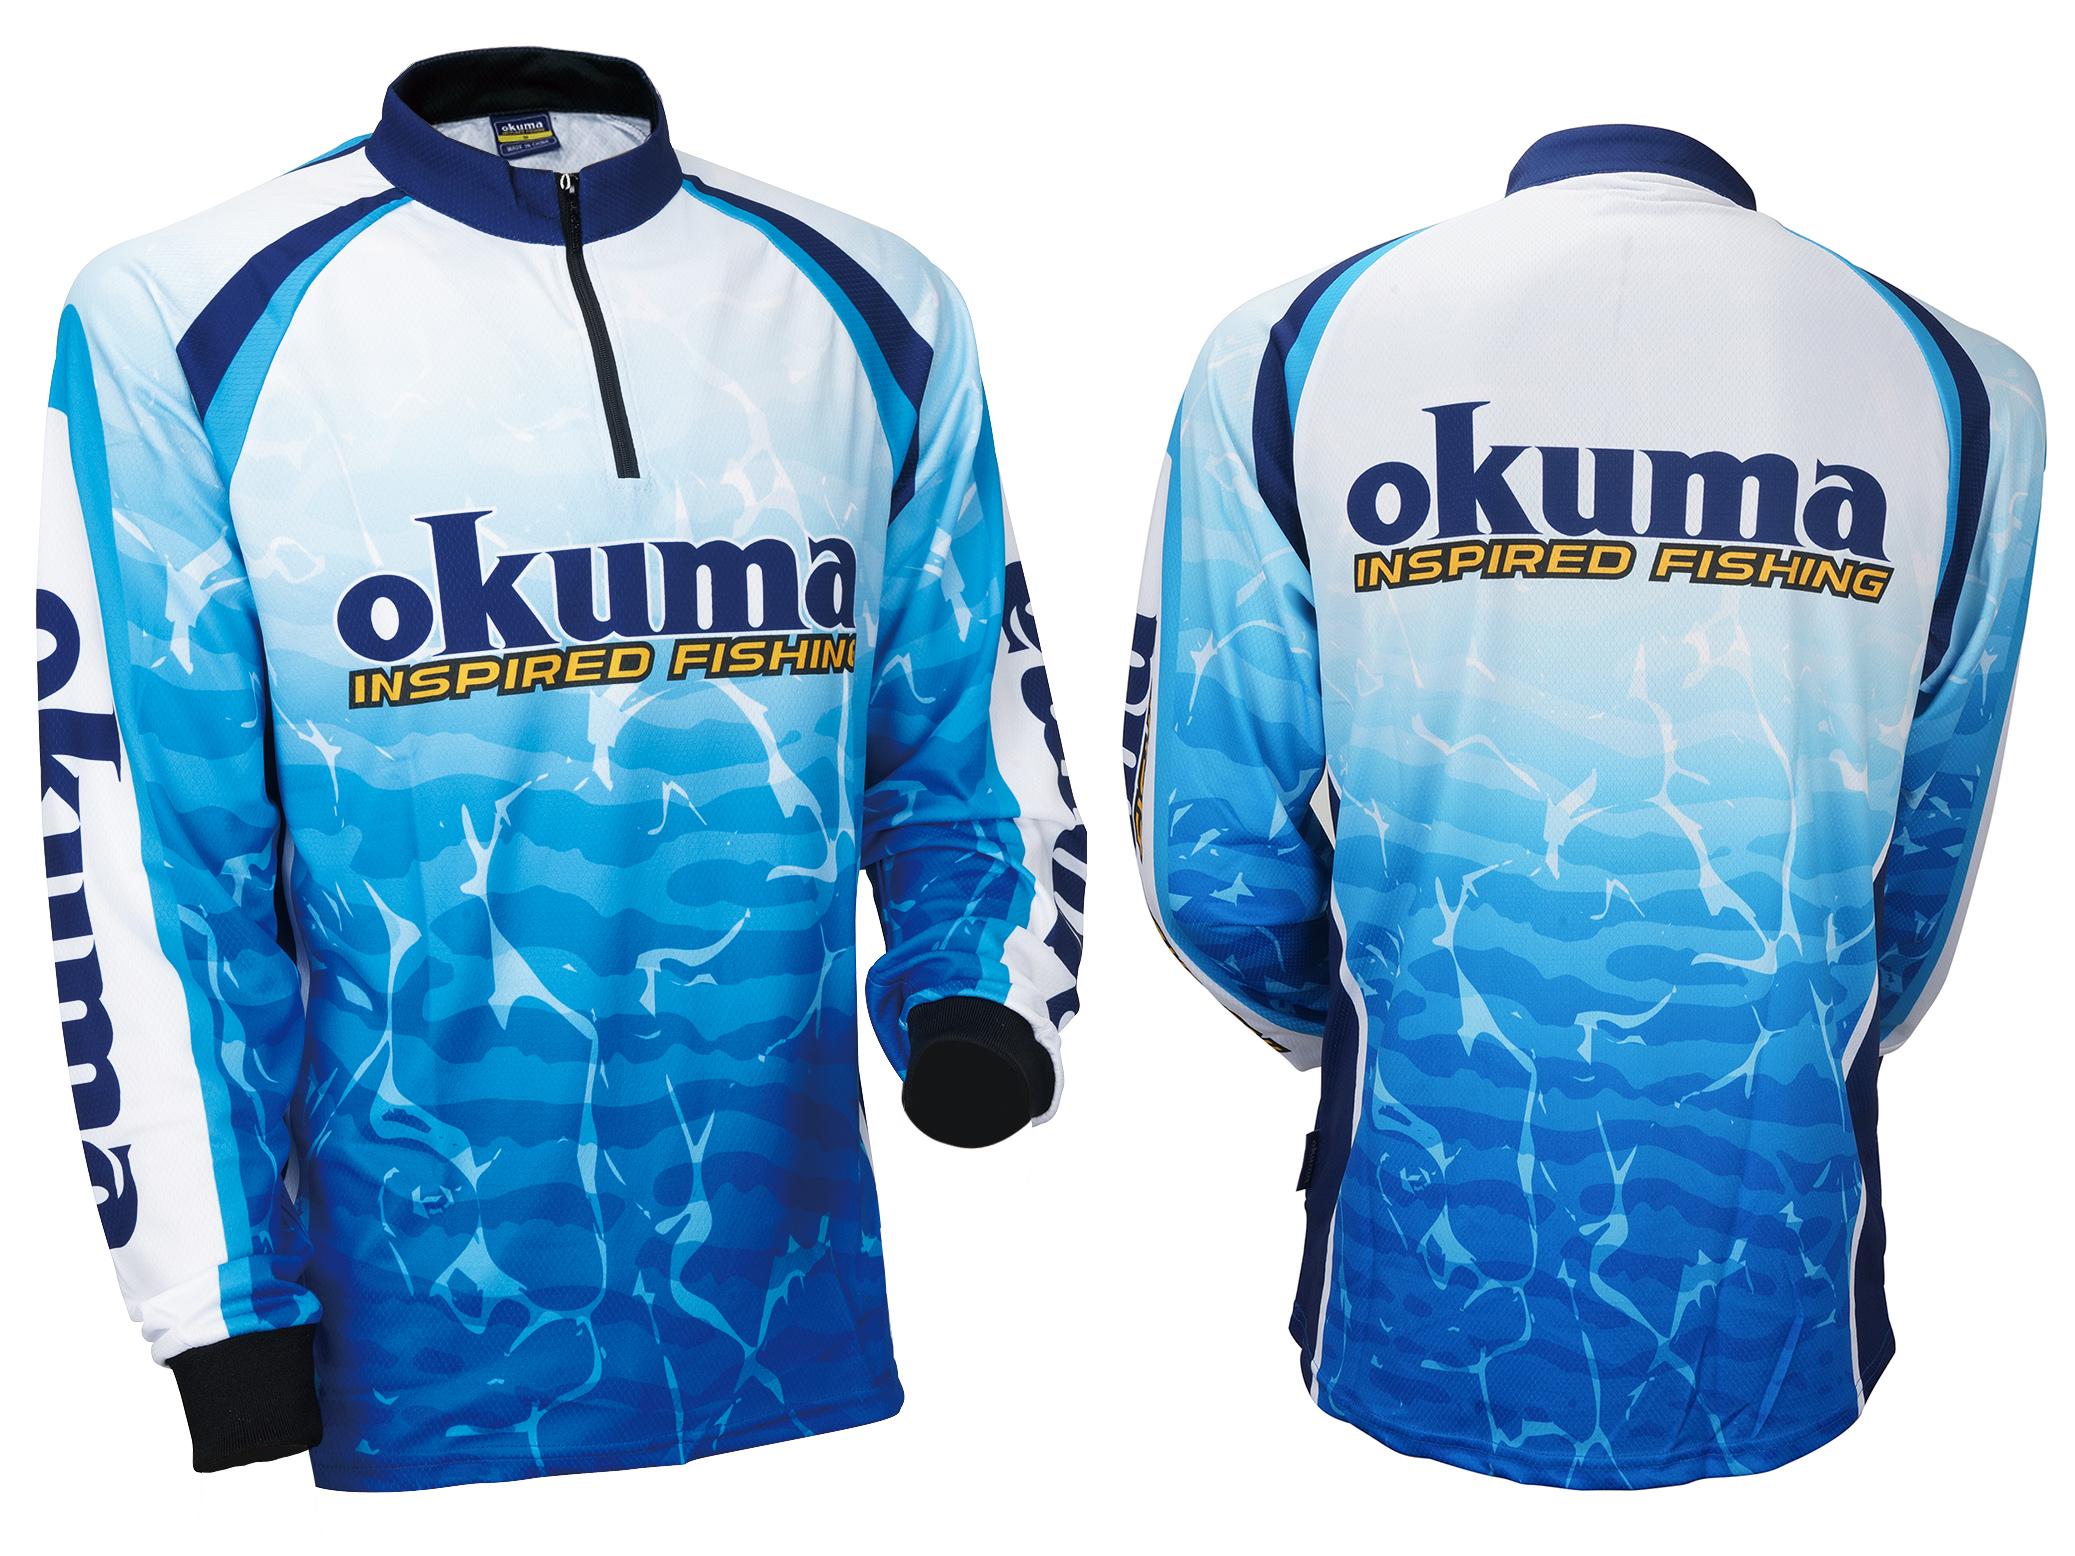 Fishing rods and reels jerseys manufacturer okuma for Fishing sponsor shirts